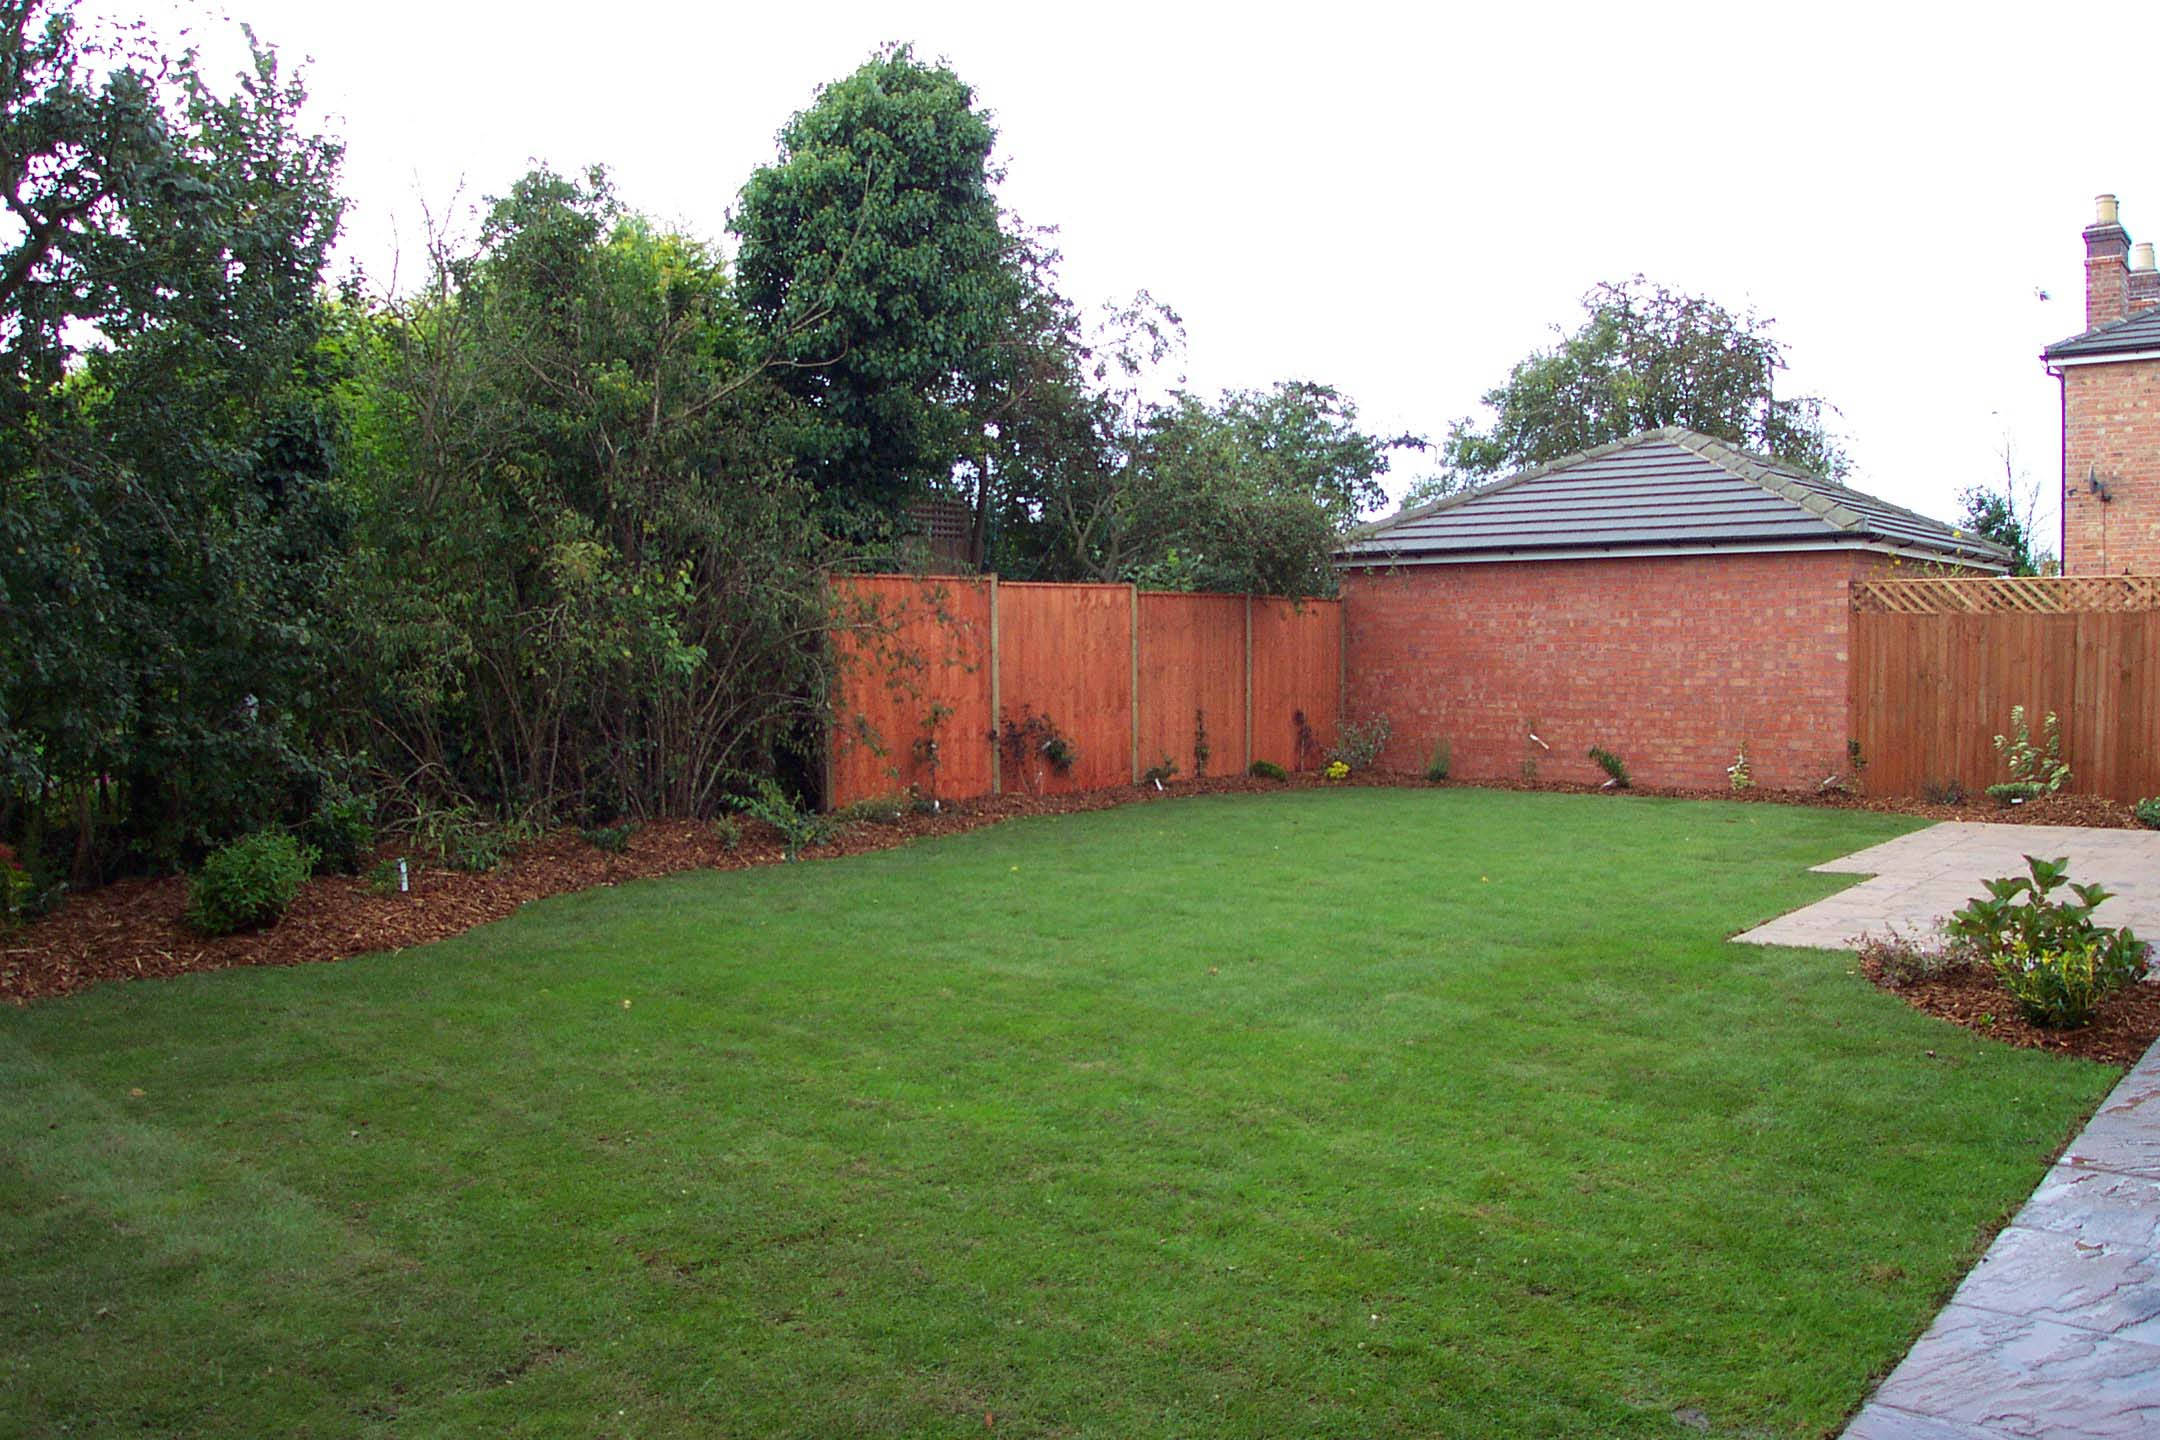 Plot 1, garden